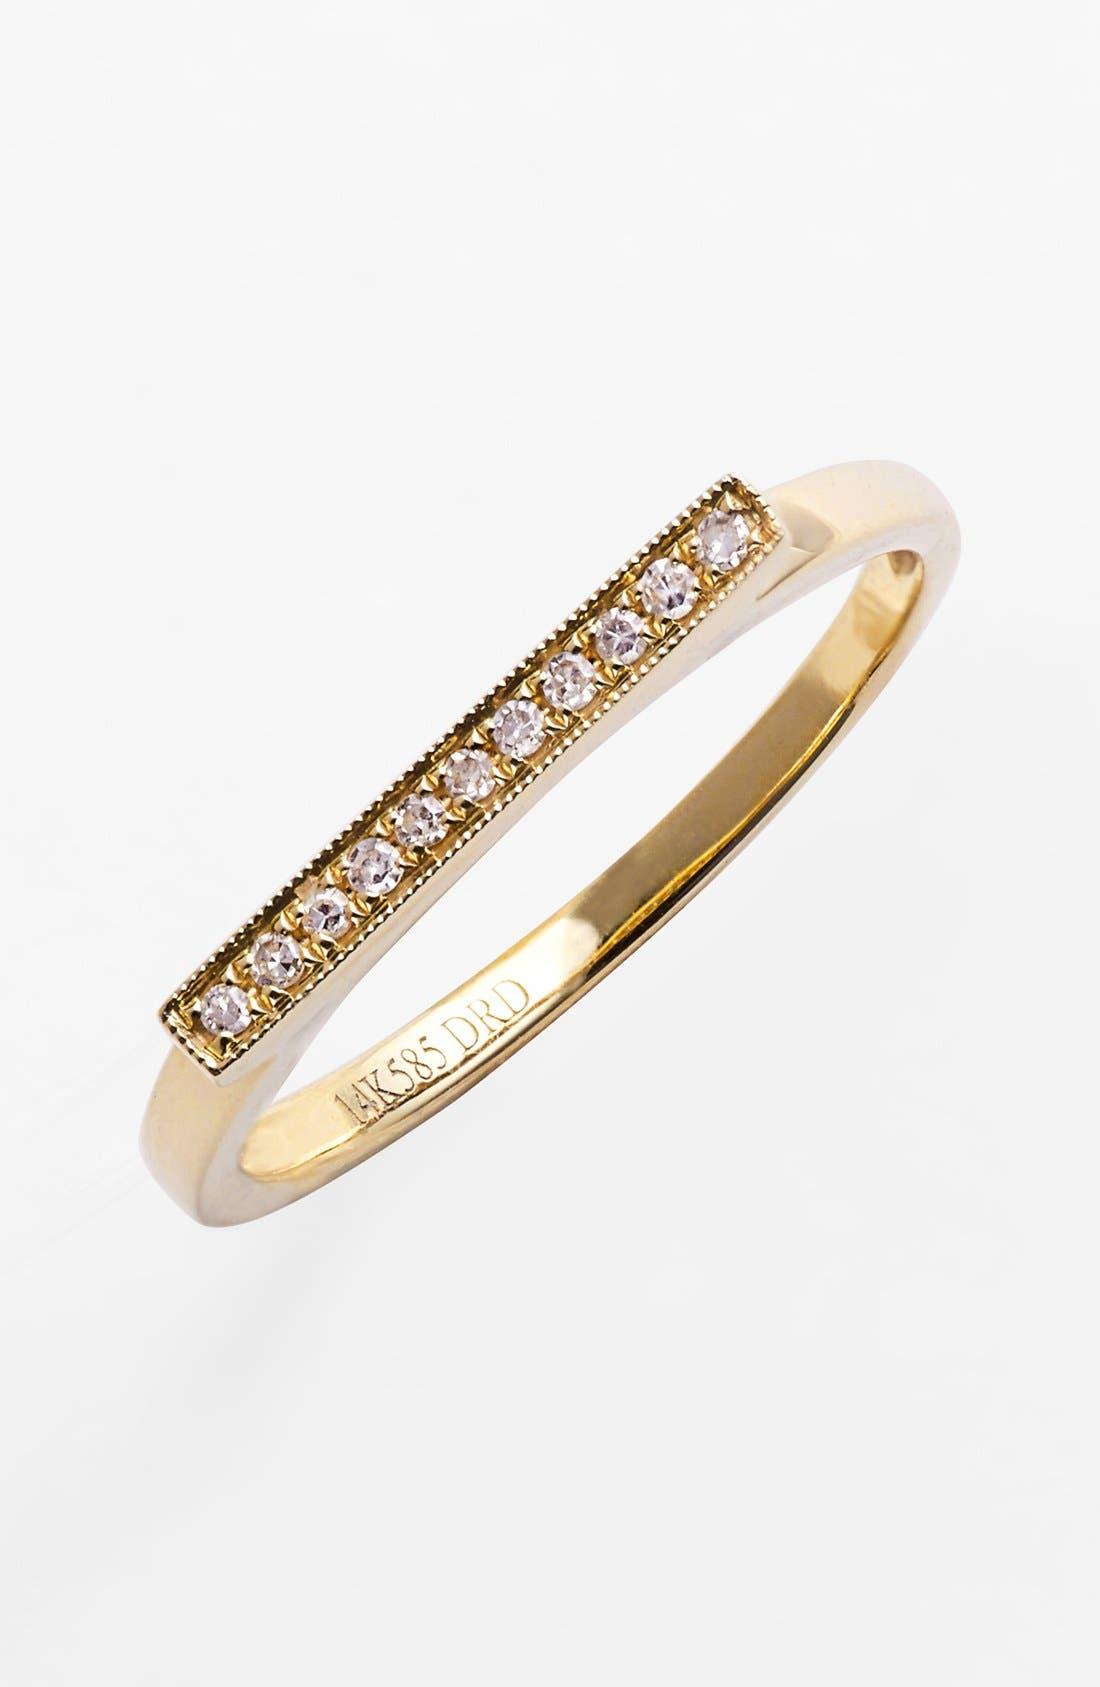 Main Image - Dana Rebecca Designs 'Sylvie Rose' Diamond Bar Ring